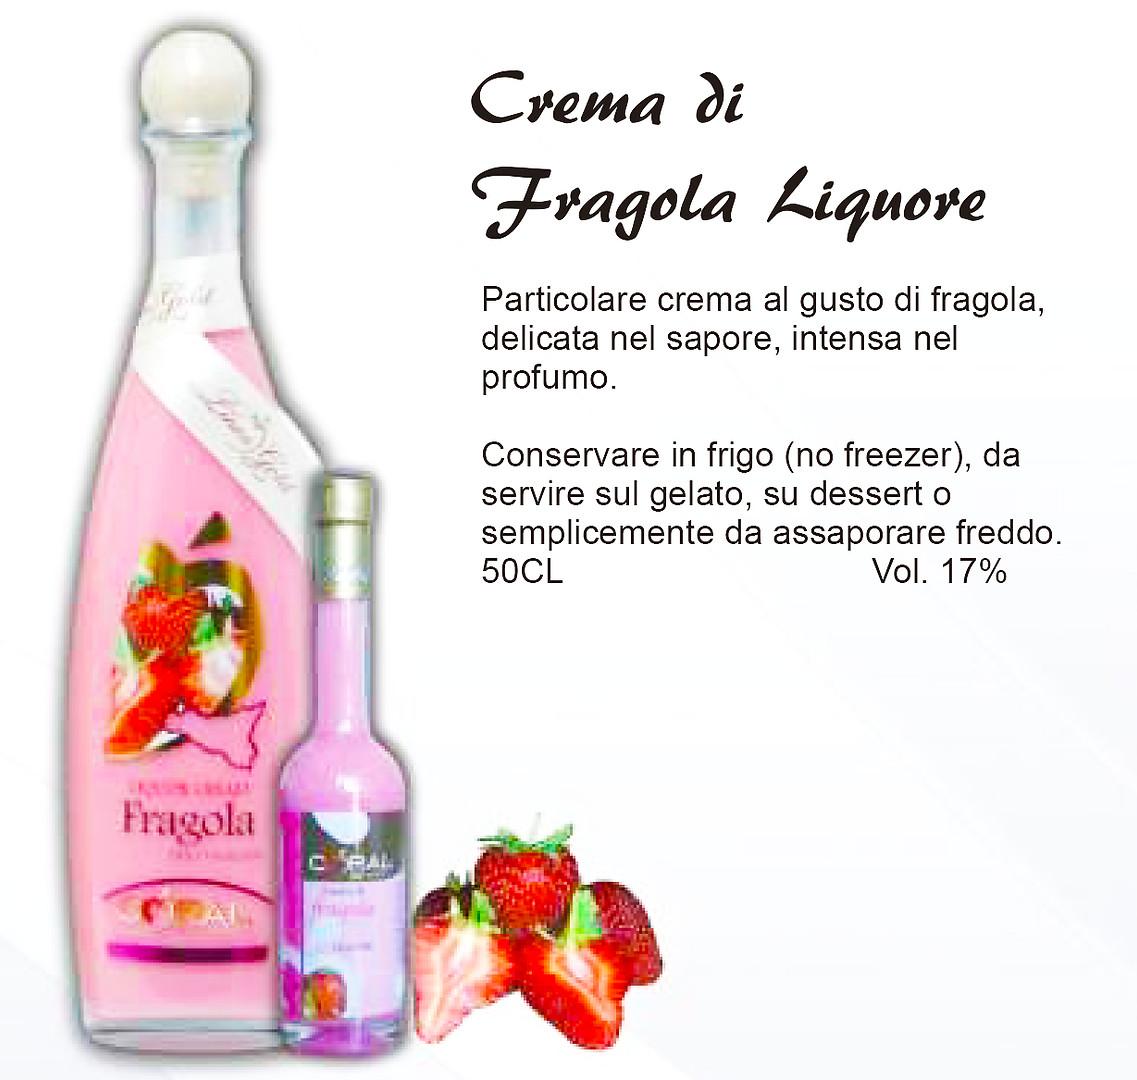 Crema di liquore Fragola